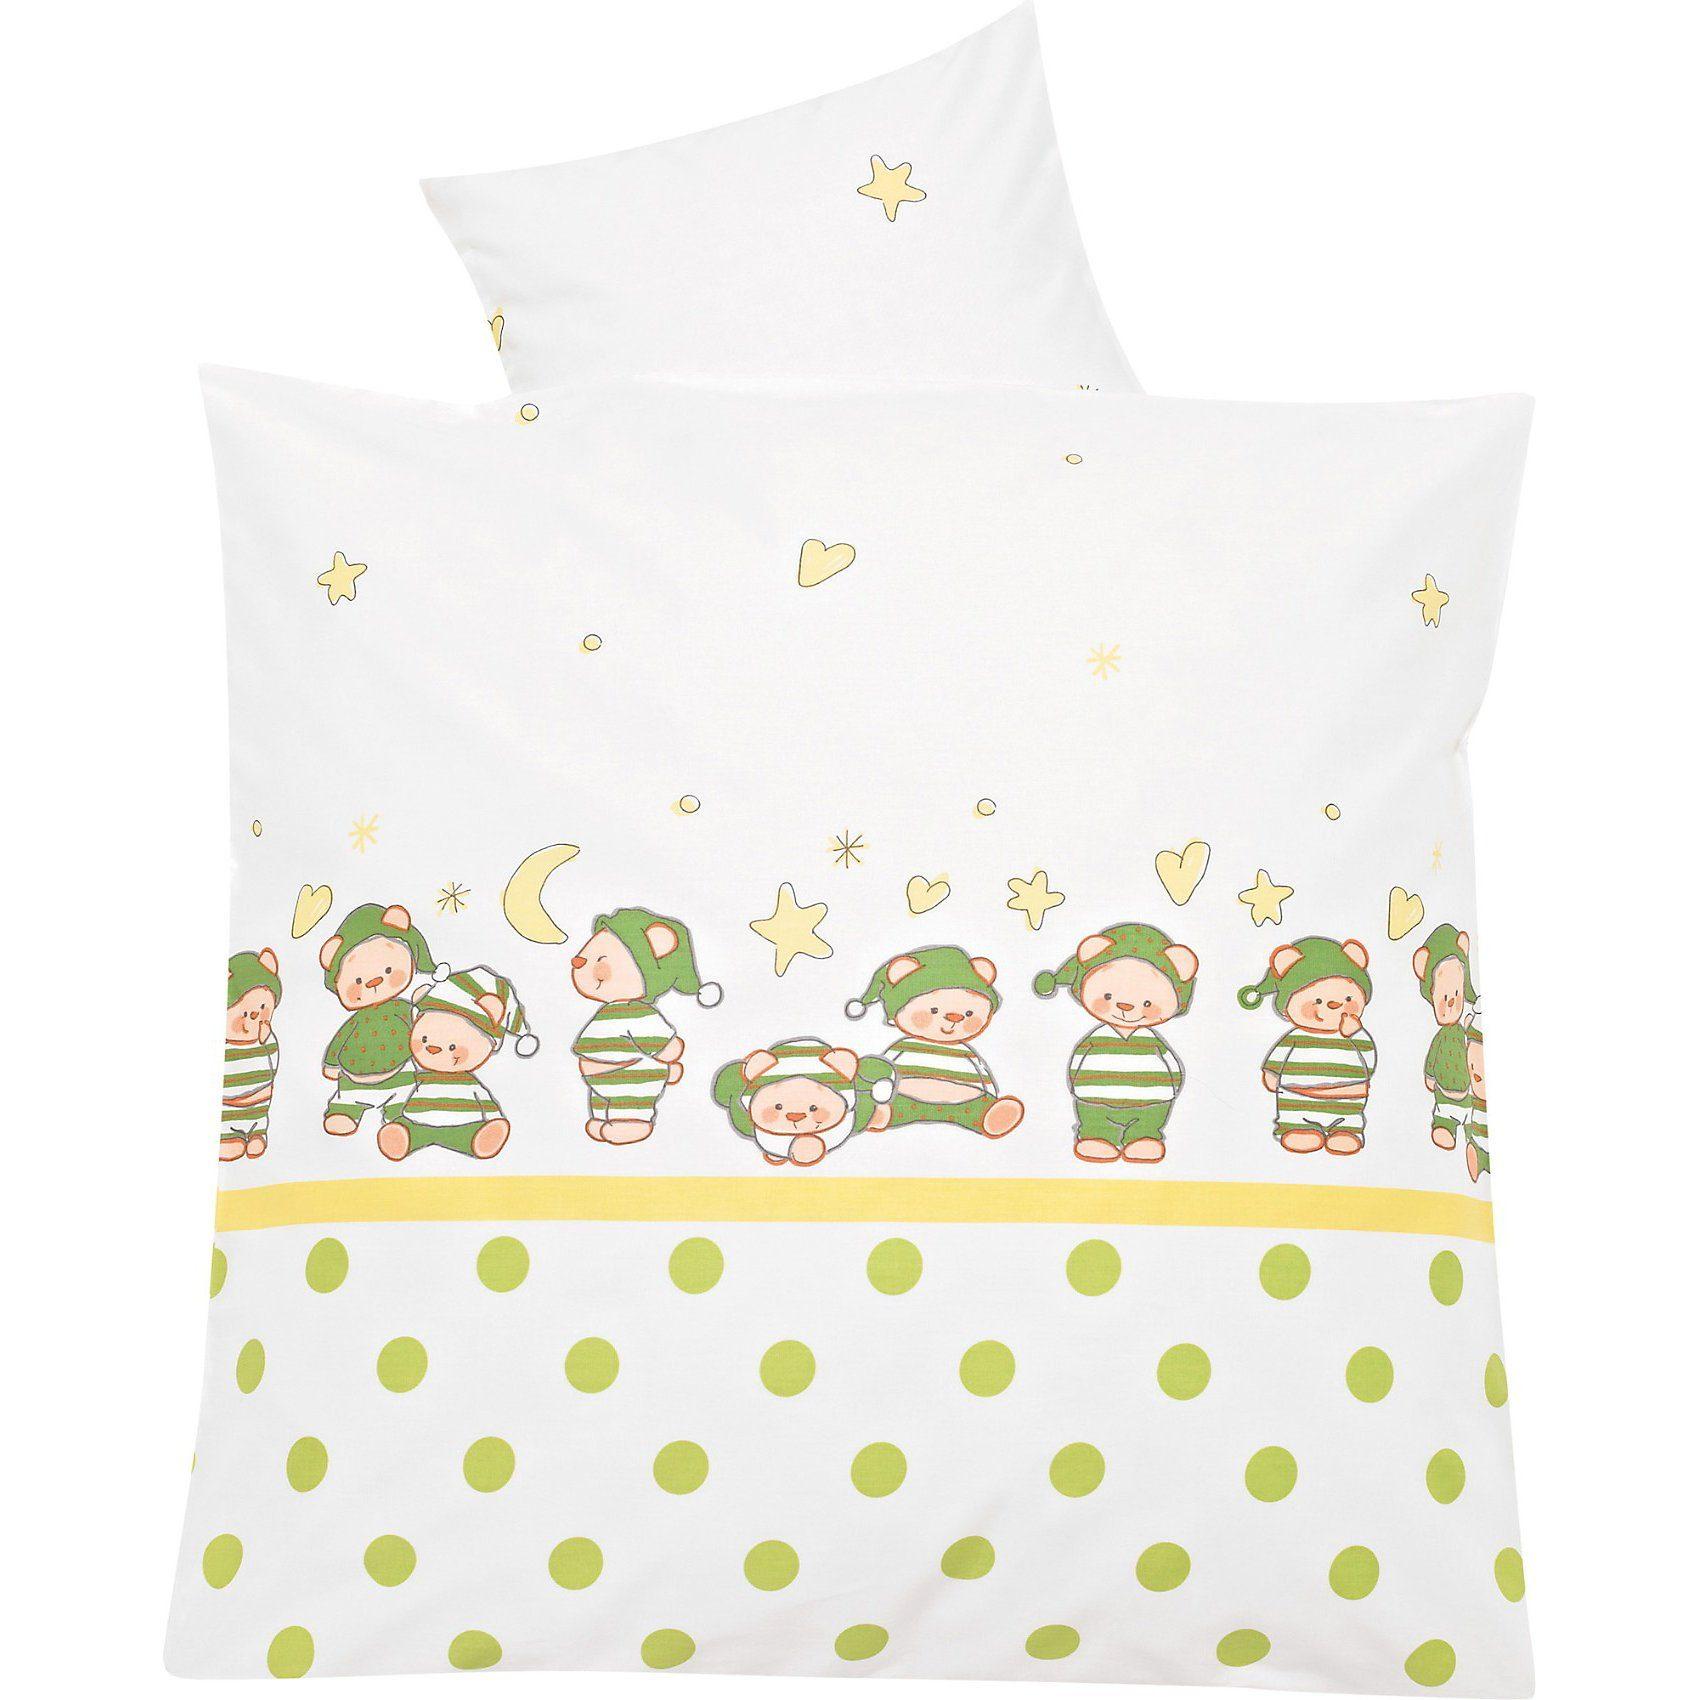 MyToys-COLLECTION Babybettwäsche Schlafmütze, grün, 80 x 80 cm